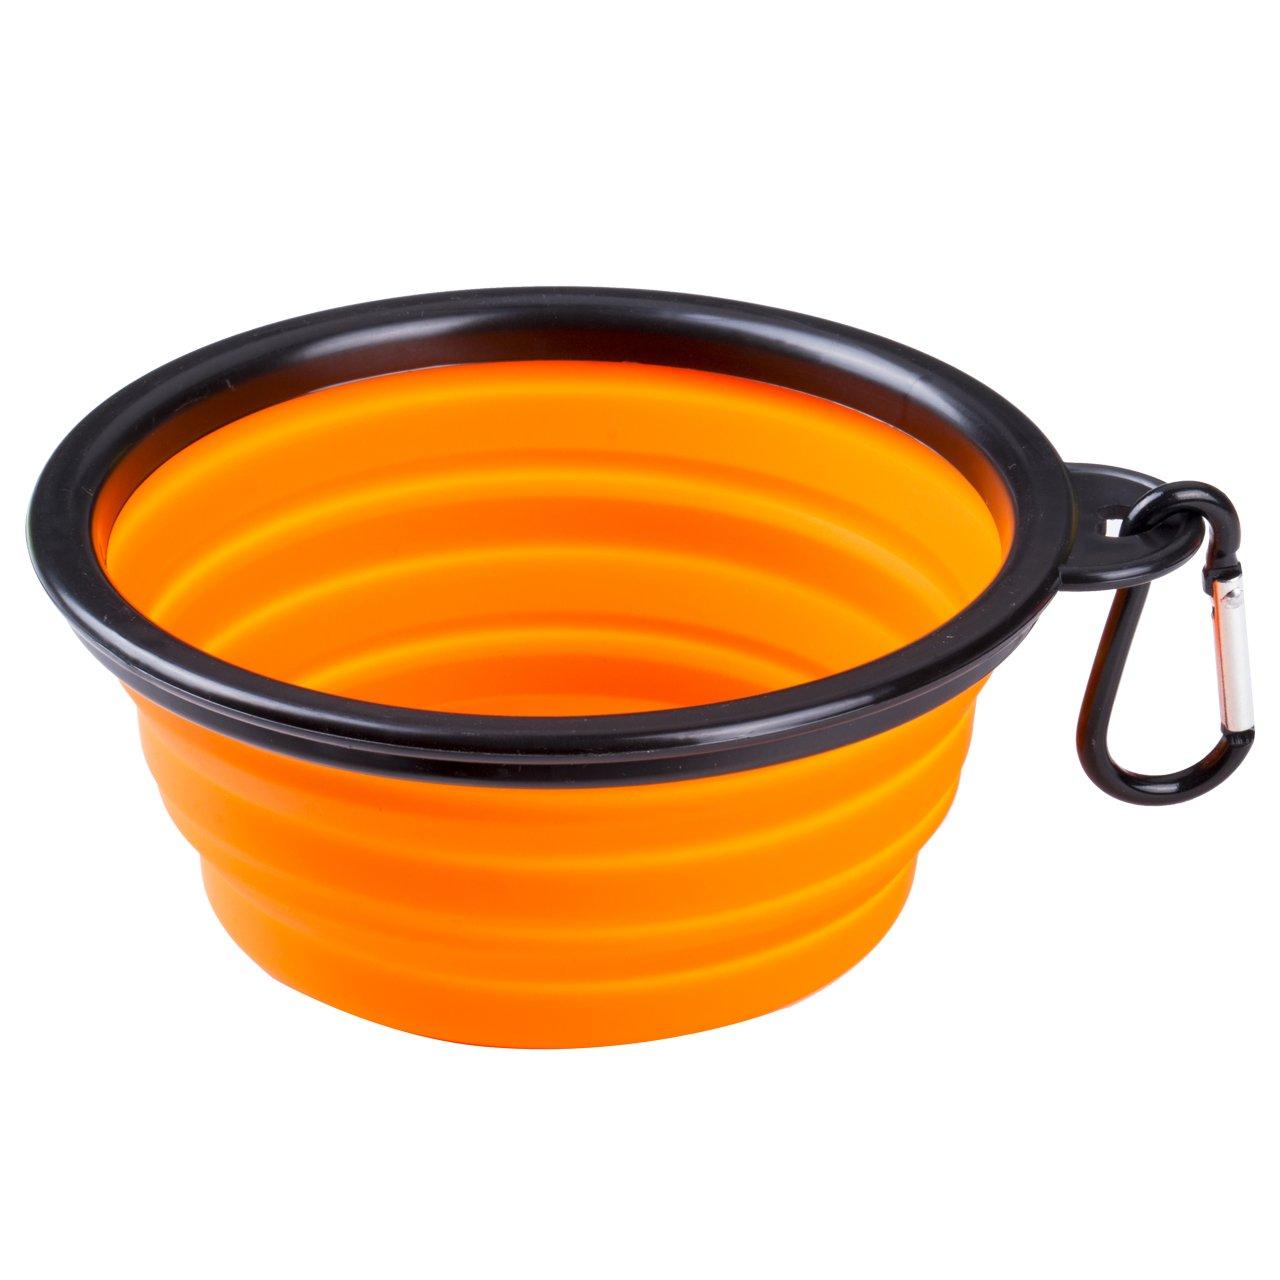 Portable Foldable Collapsible Pet Cat Dog Food Water Feeding Bowl Dish Feeder (Orange)